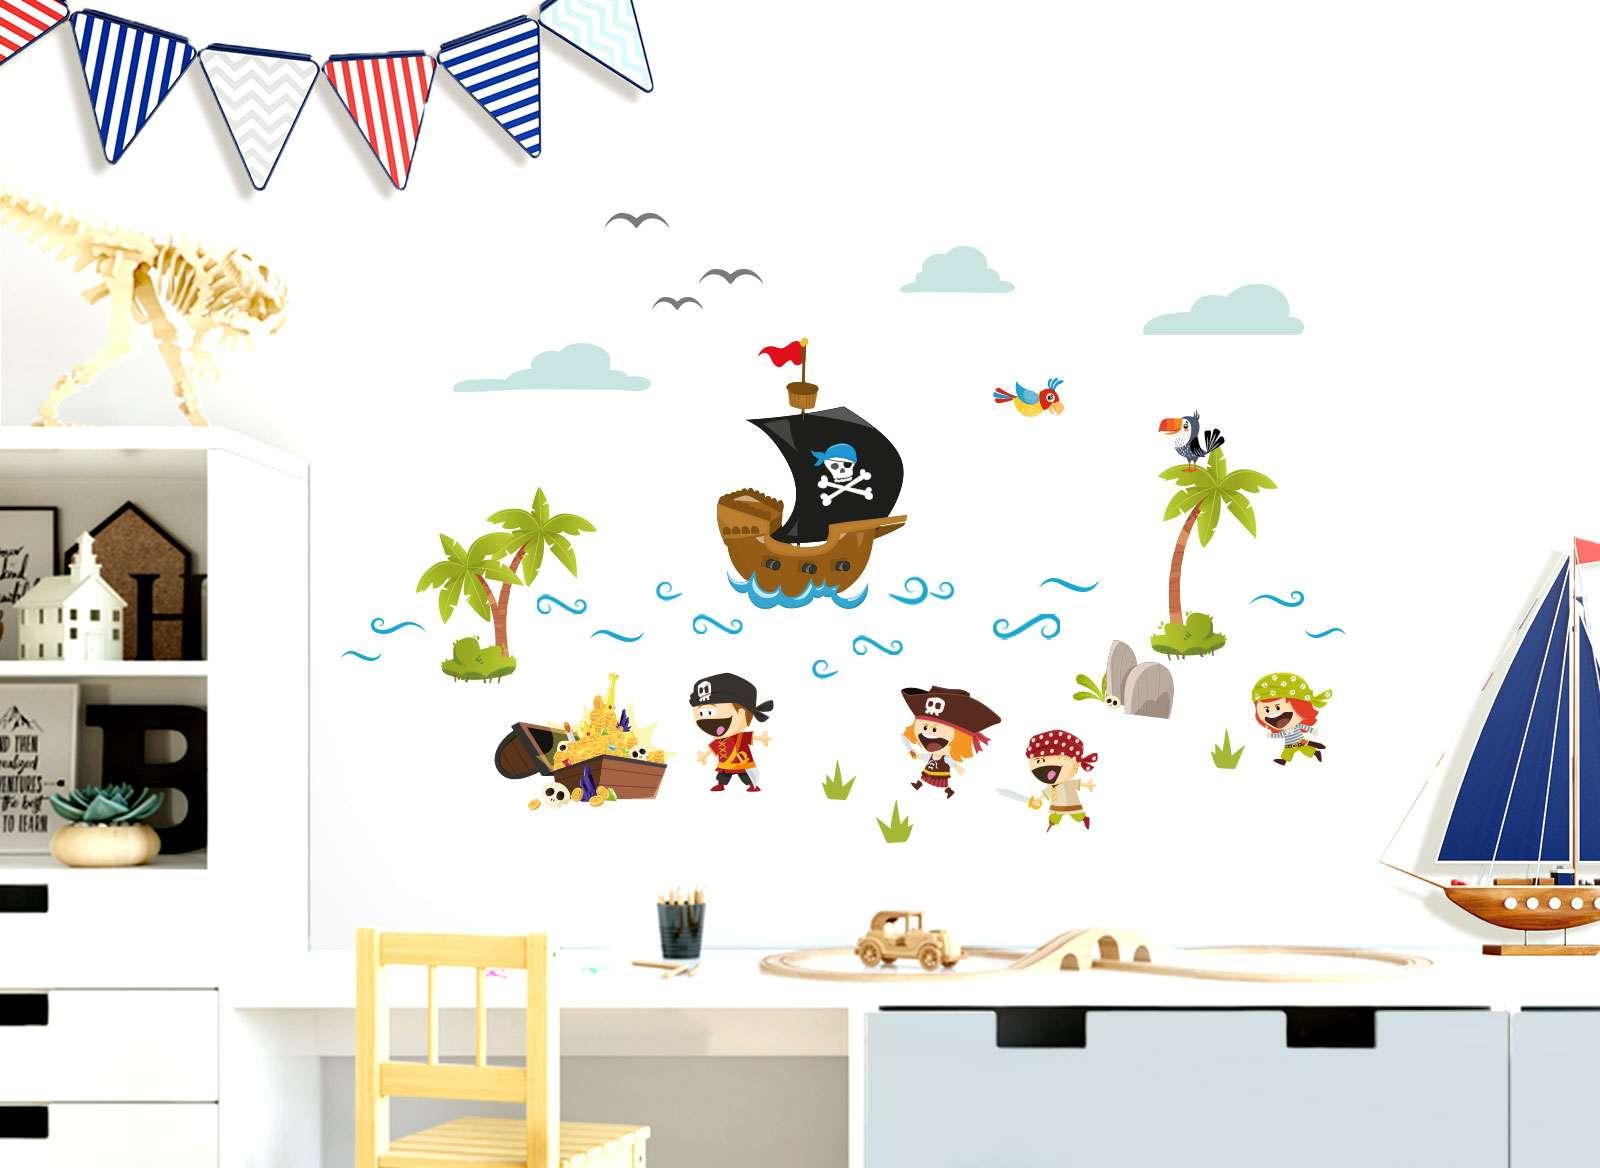 Full Size of Piraten Kinderzimmer Little Deco Wandtattoo Schiff Schatz Dl330 Jungs Regale Regal Sofa Weiß Kinderzimmer Piraten Kinderzimmer